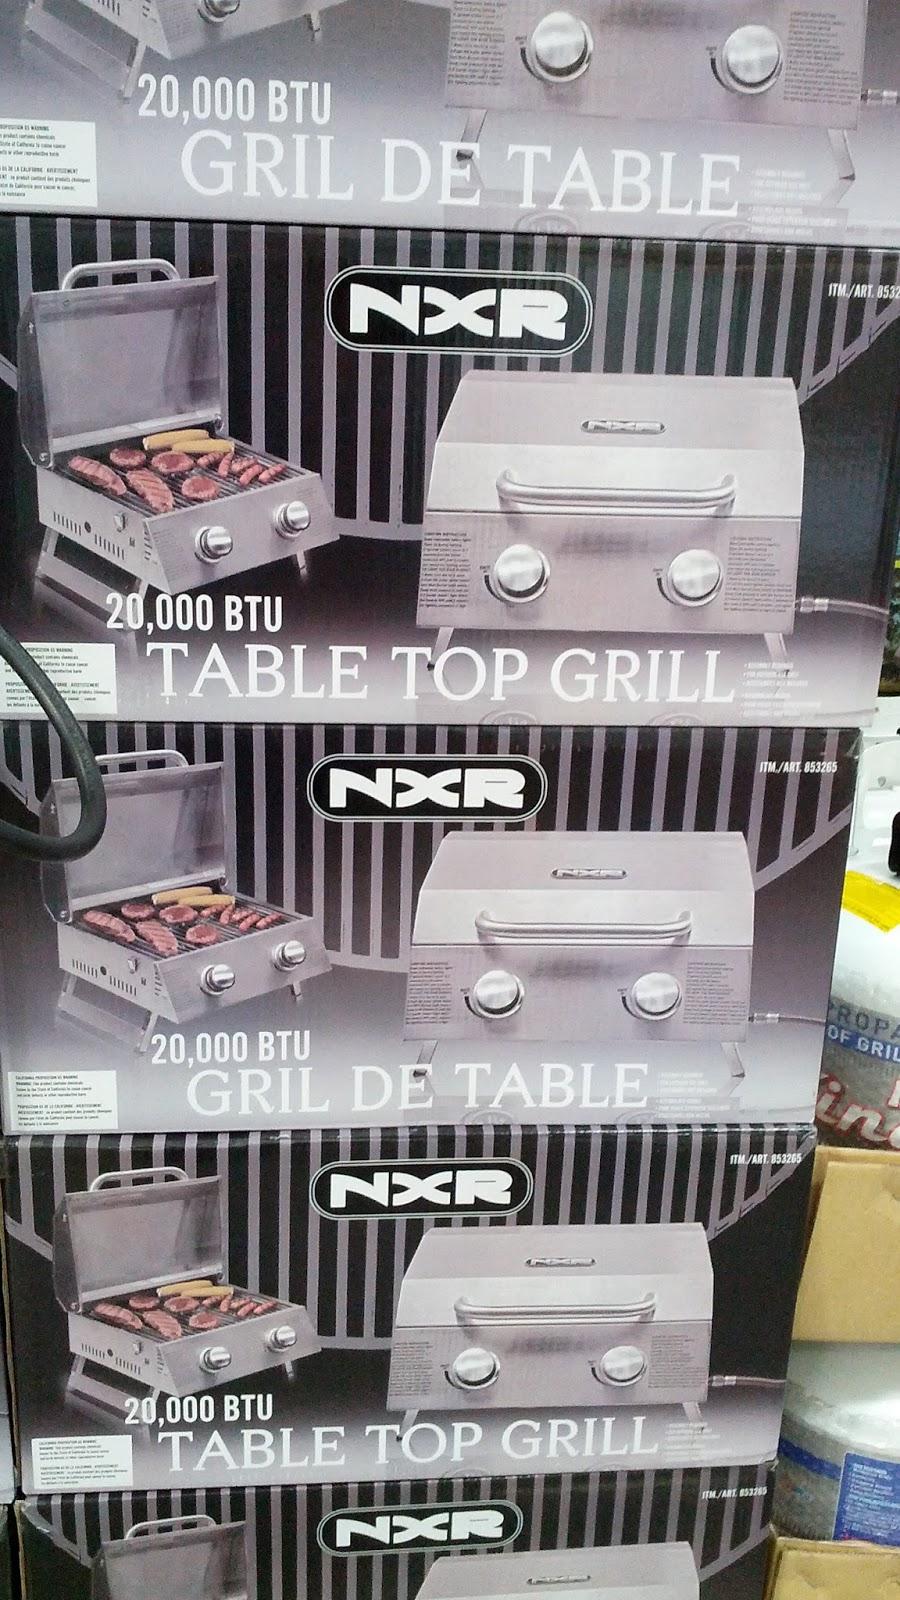 Costco Portable Bbq : Duro nxr table top gas bbq grill costco weekender